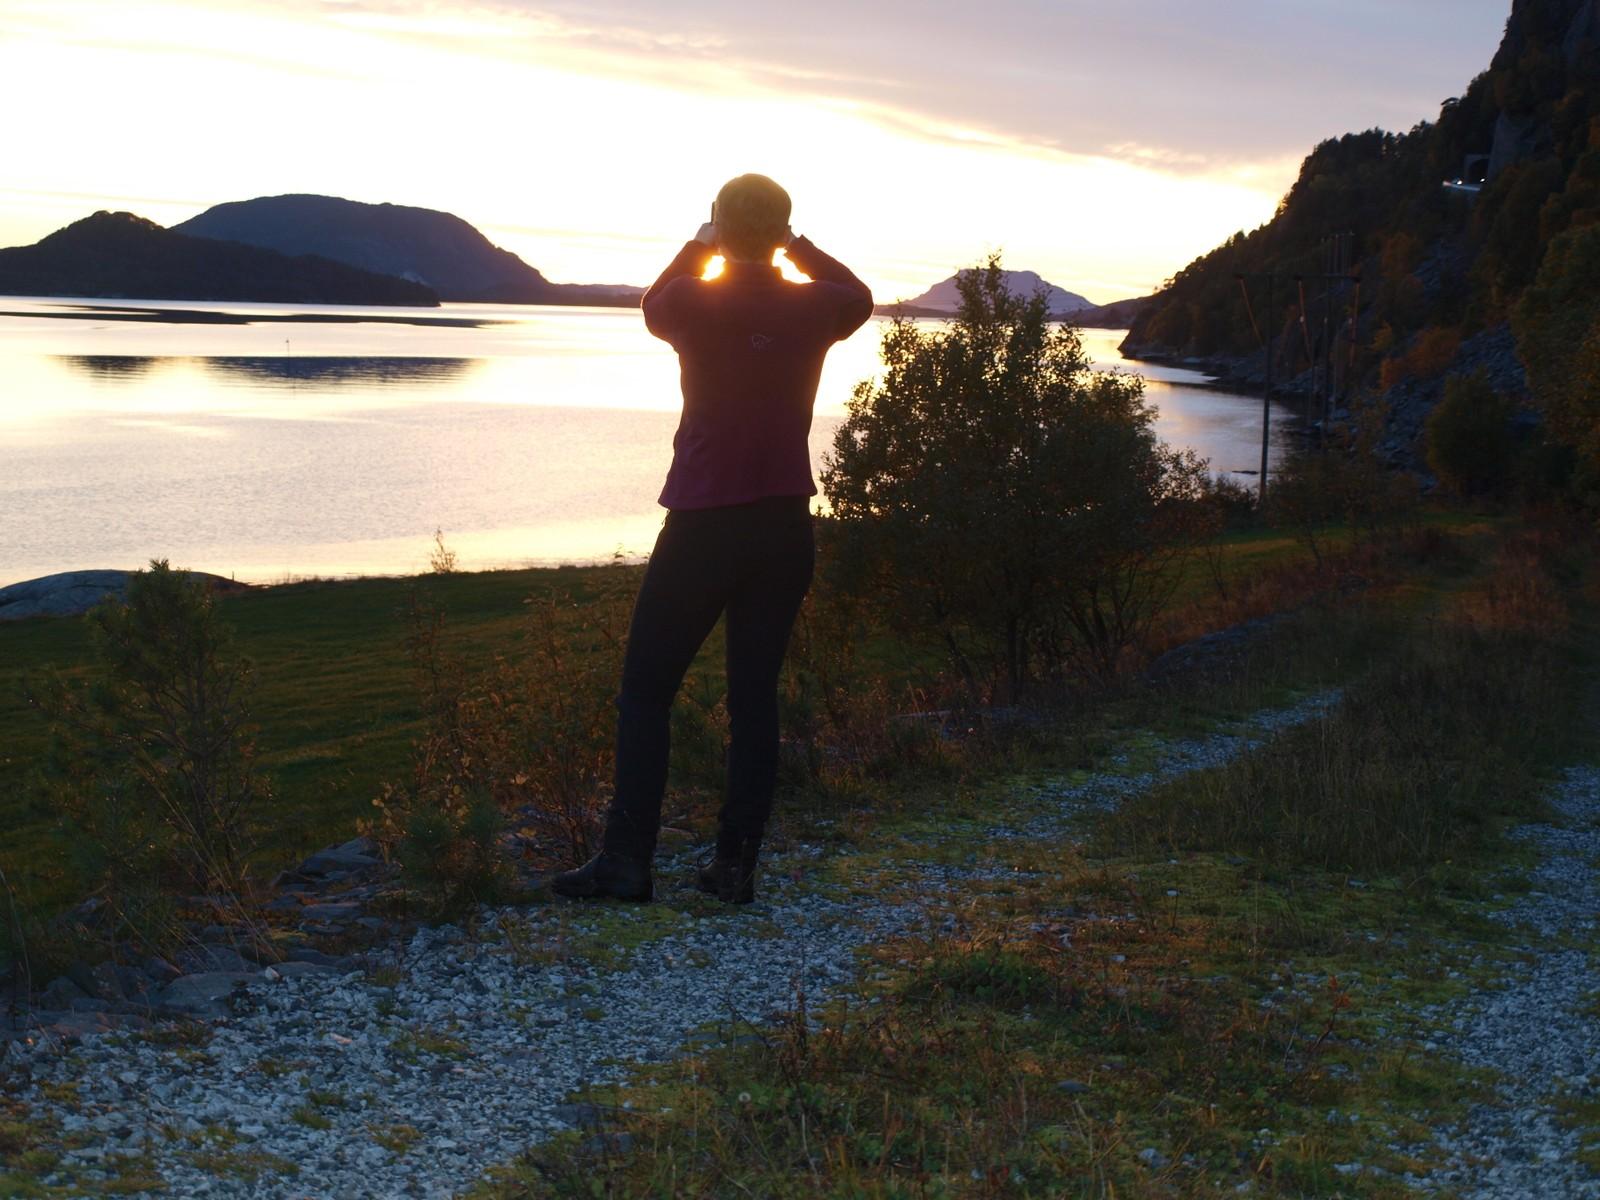 Fotograf i solnedgang.